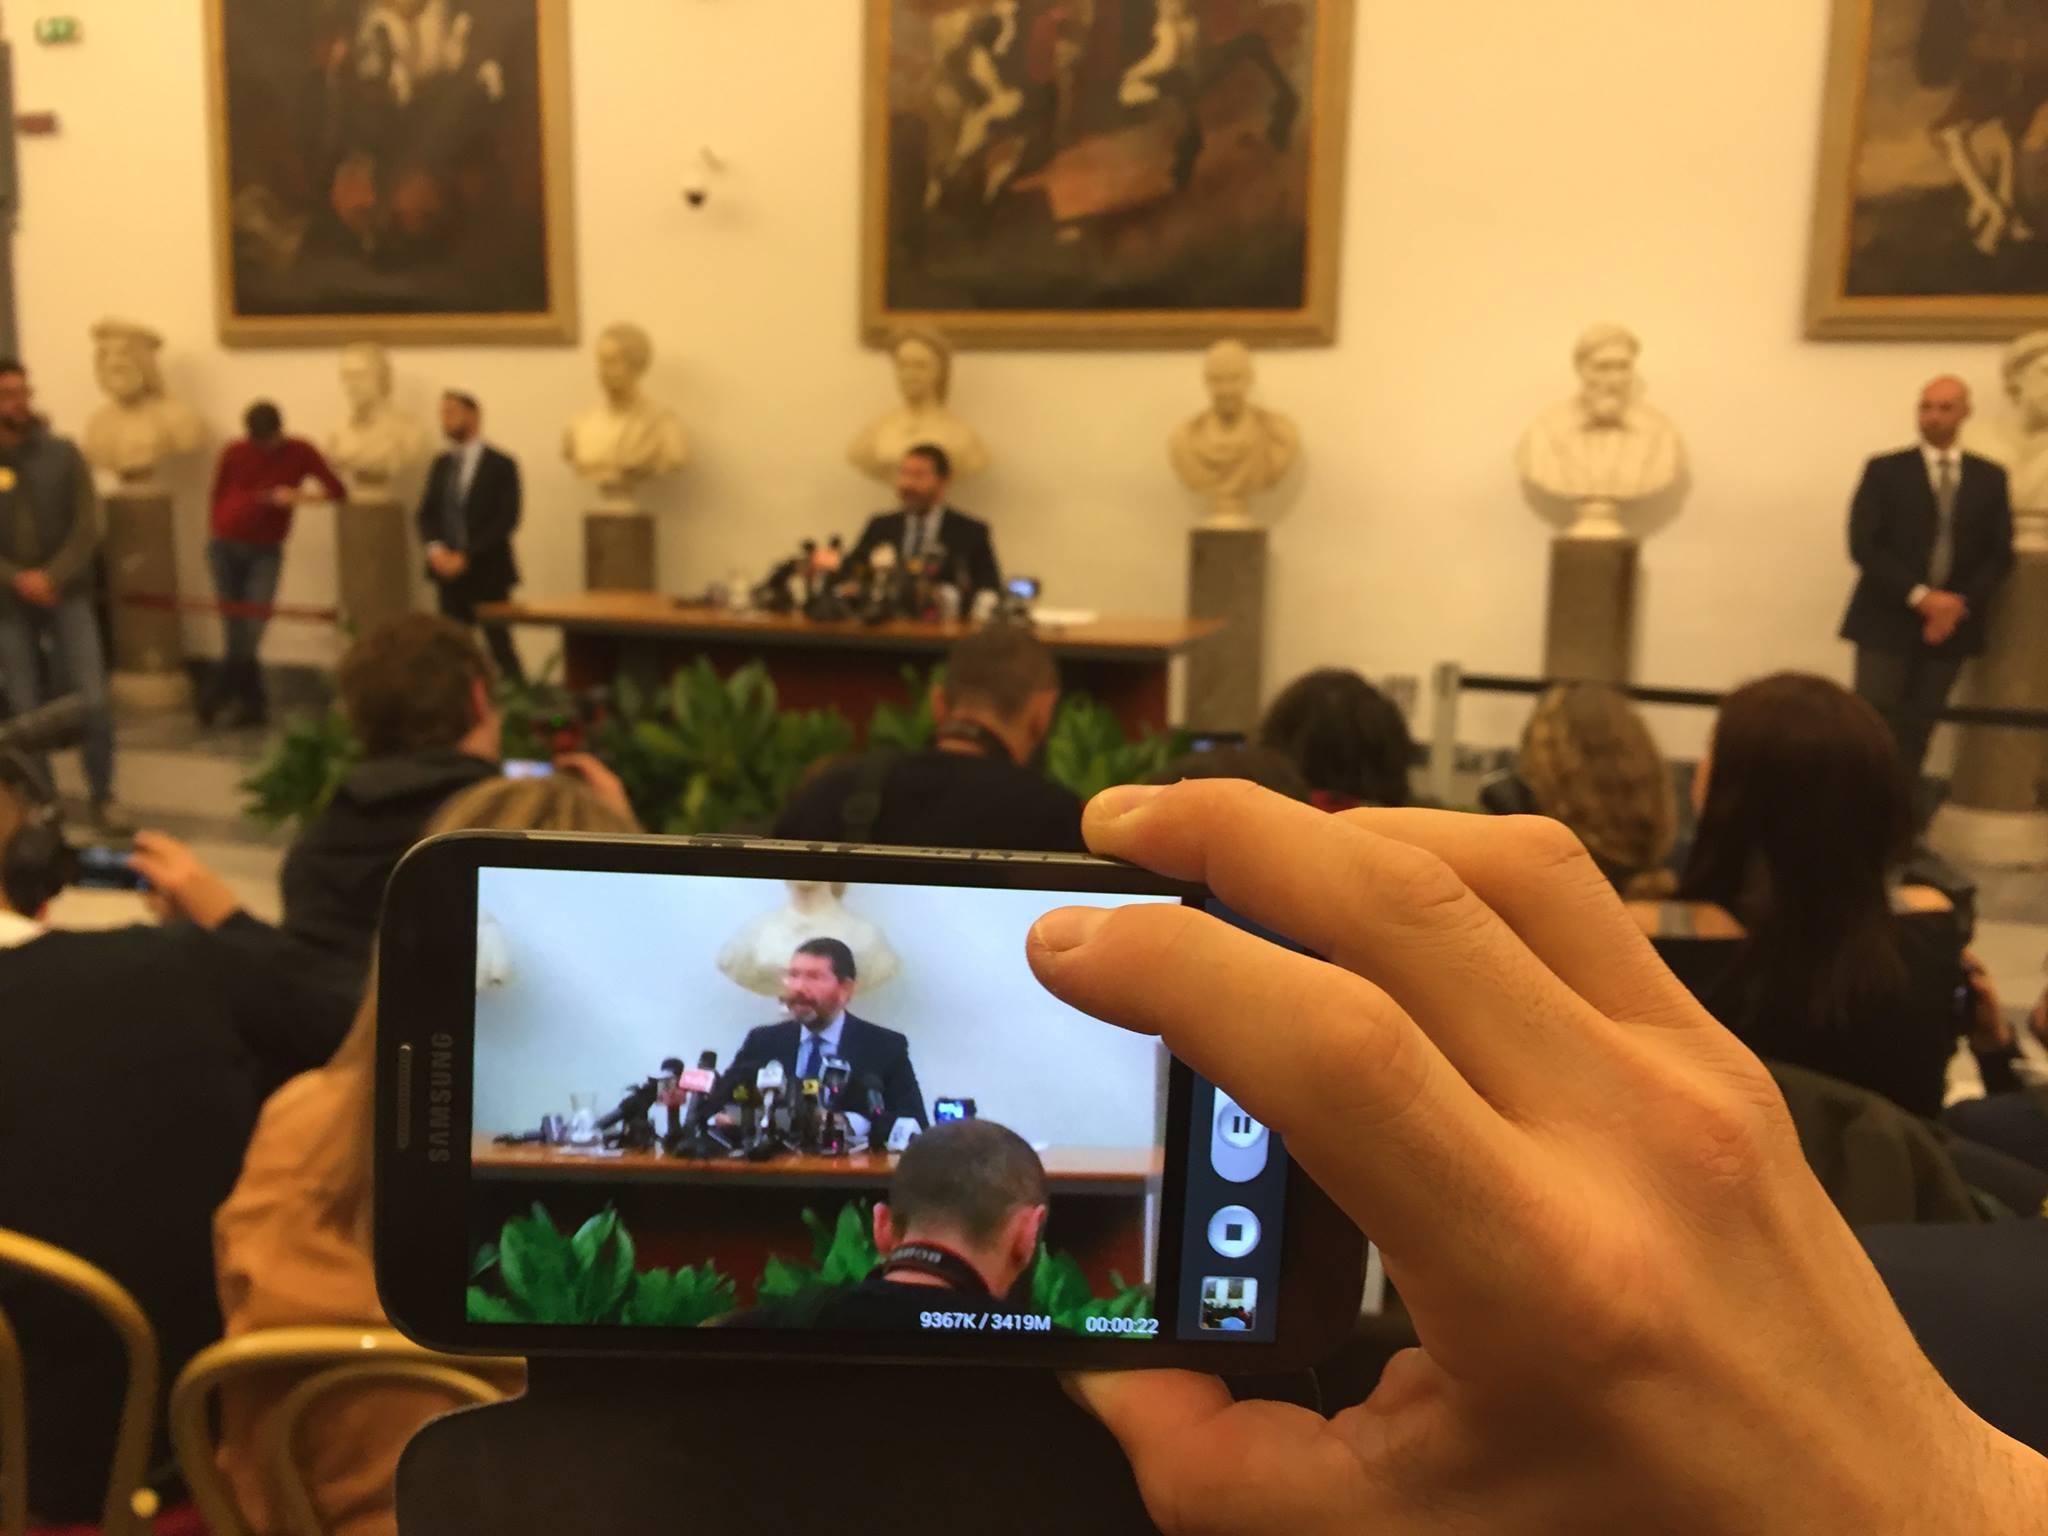 conferenza stampa Marino 30 ottobre 2015 (foto ambm)